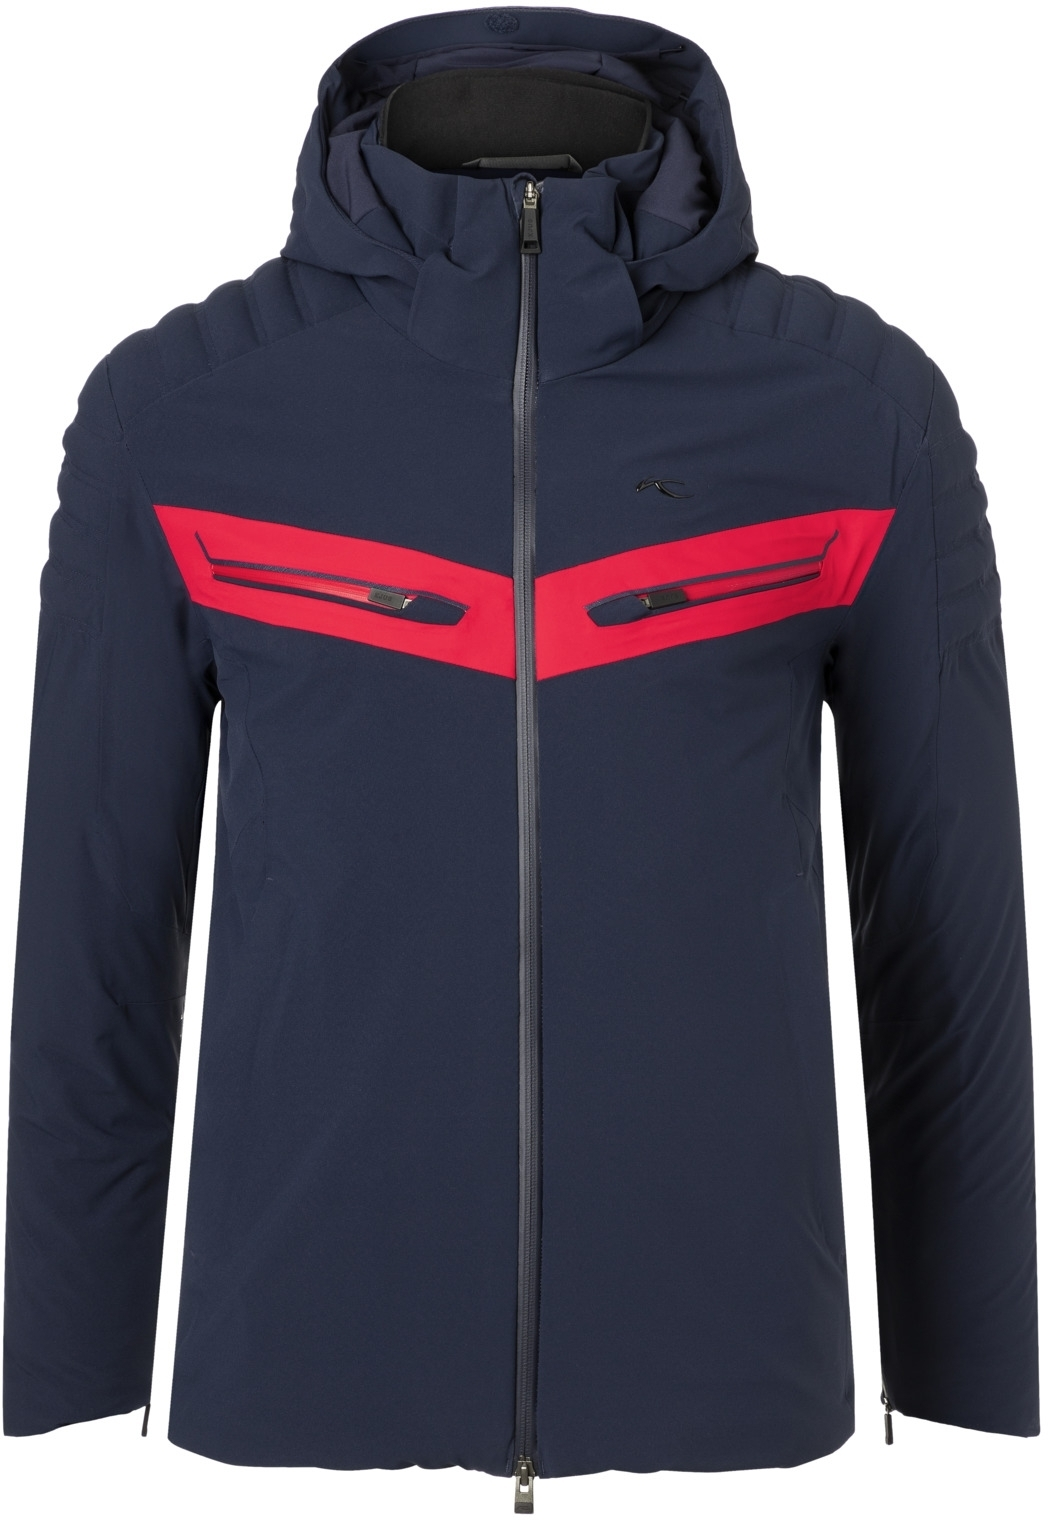 Pánská lyžařská bunda Kjus Men Cuche II Jacket - atlanta blue - Ski ... 020383bbc0